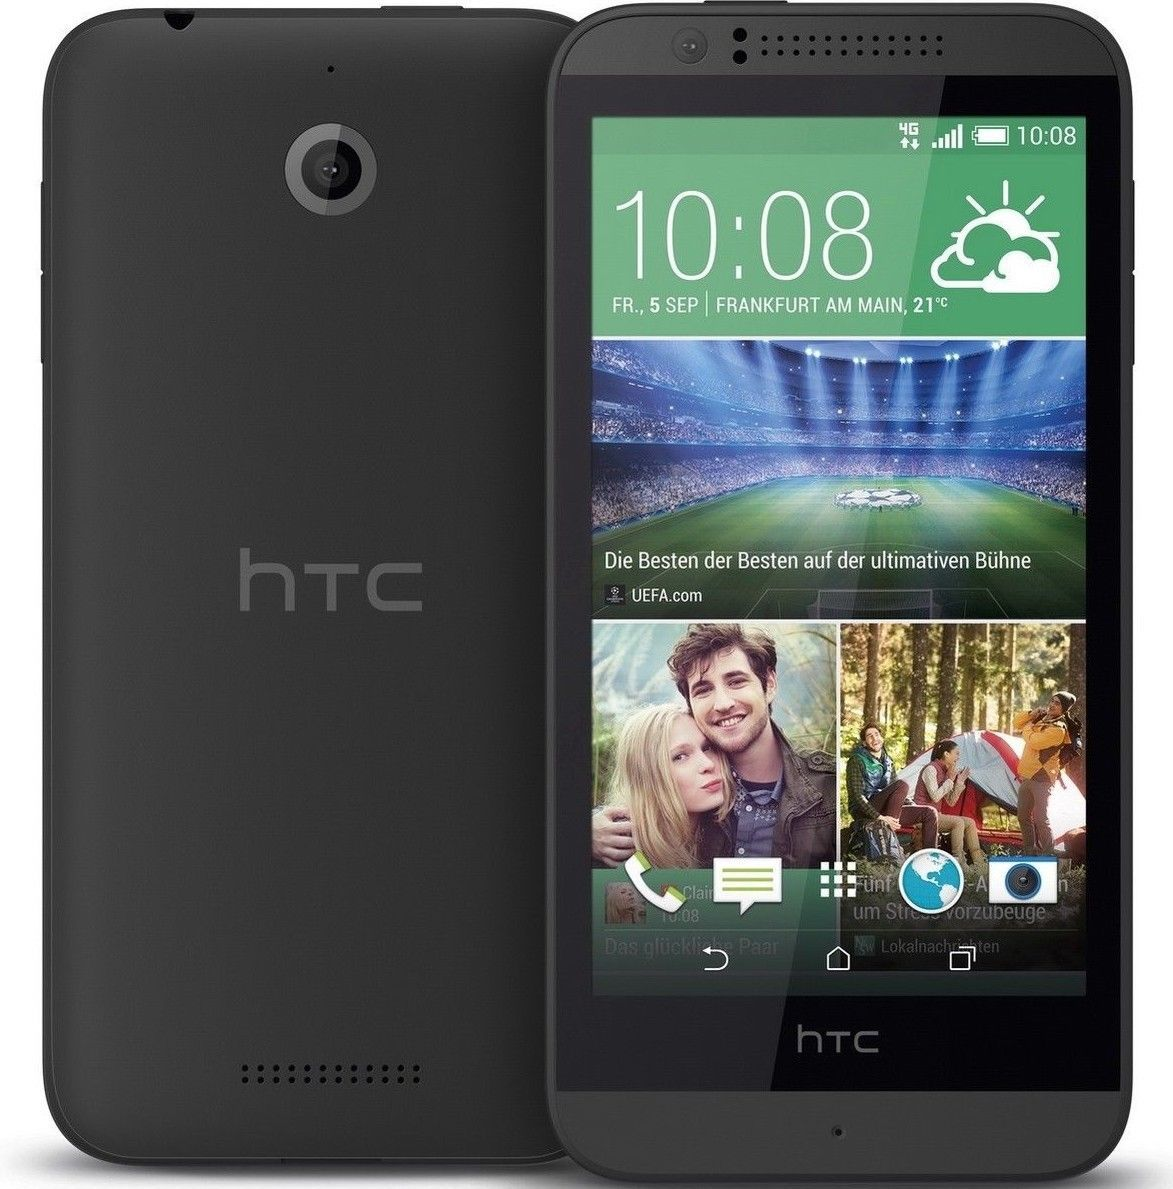 HTC Desire 510 - 8GB (GSM UNLOCKED) 5.0MP Smartphone   Black